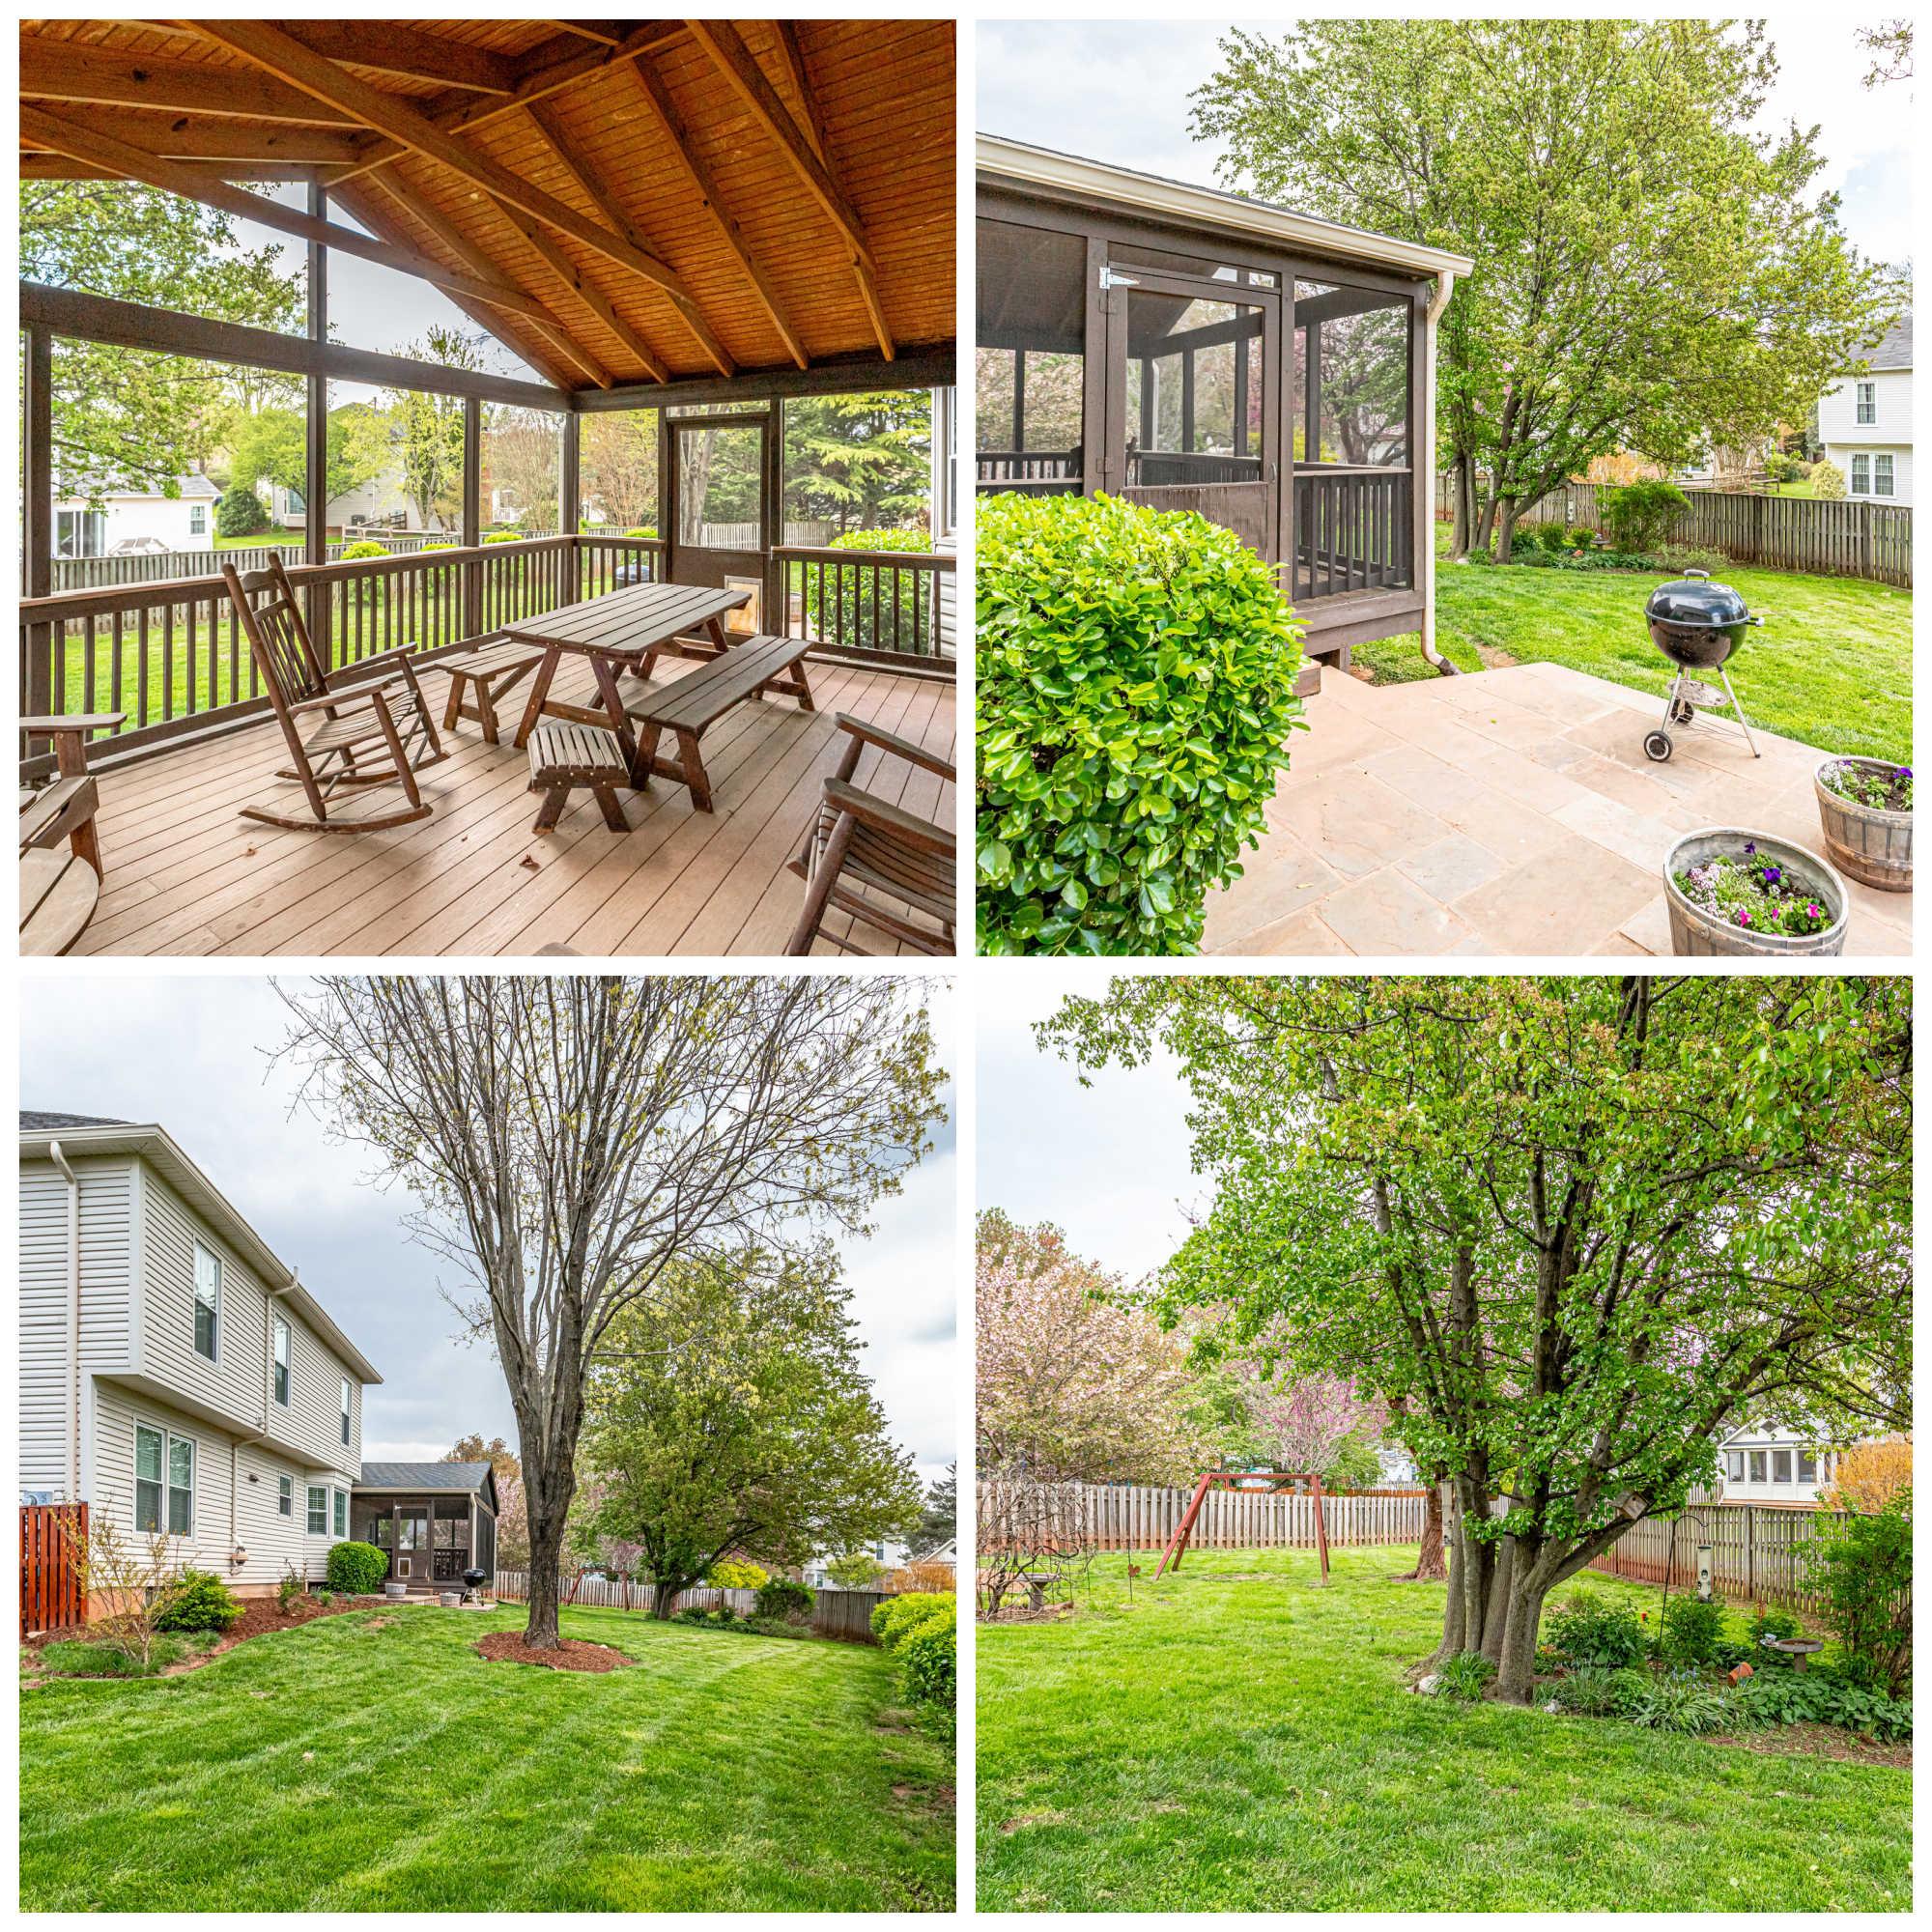 3209 Kilbrennan Ct, Oak Hill- Porch, Patio and Yard